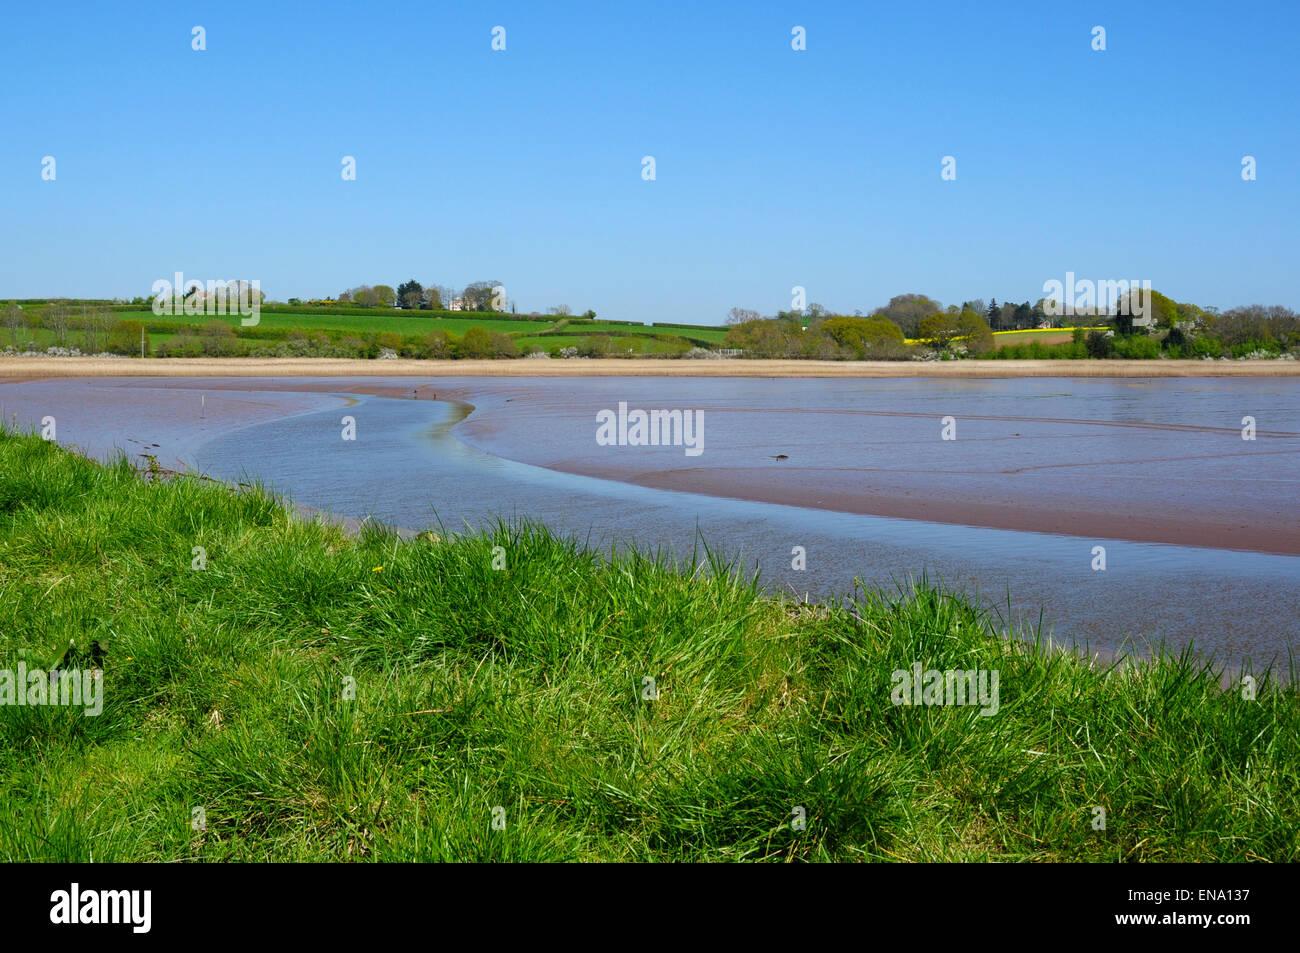 Low tide on the Rive Exe estuary, Bowling Green Marsh, Topsham, Devon, England, UK - Stock Image